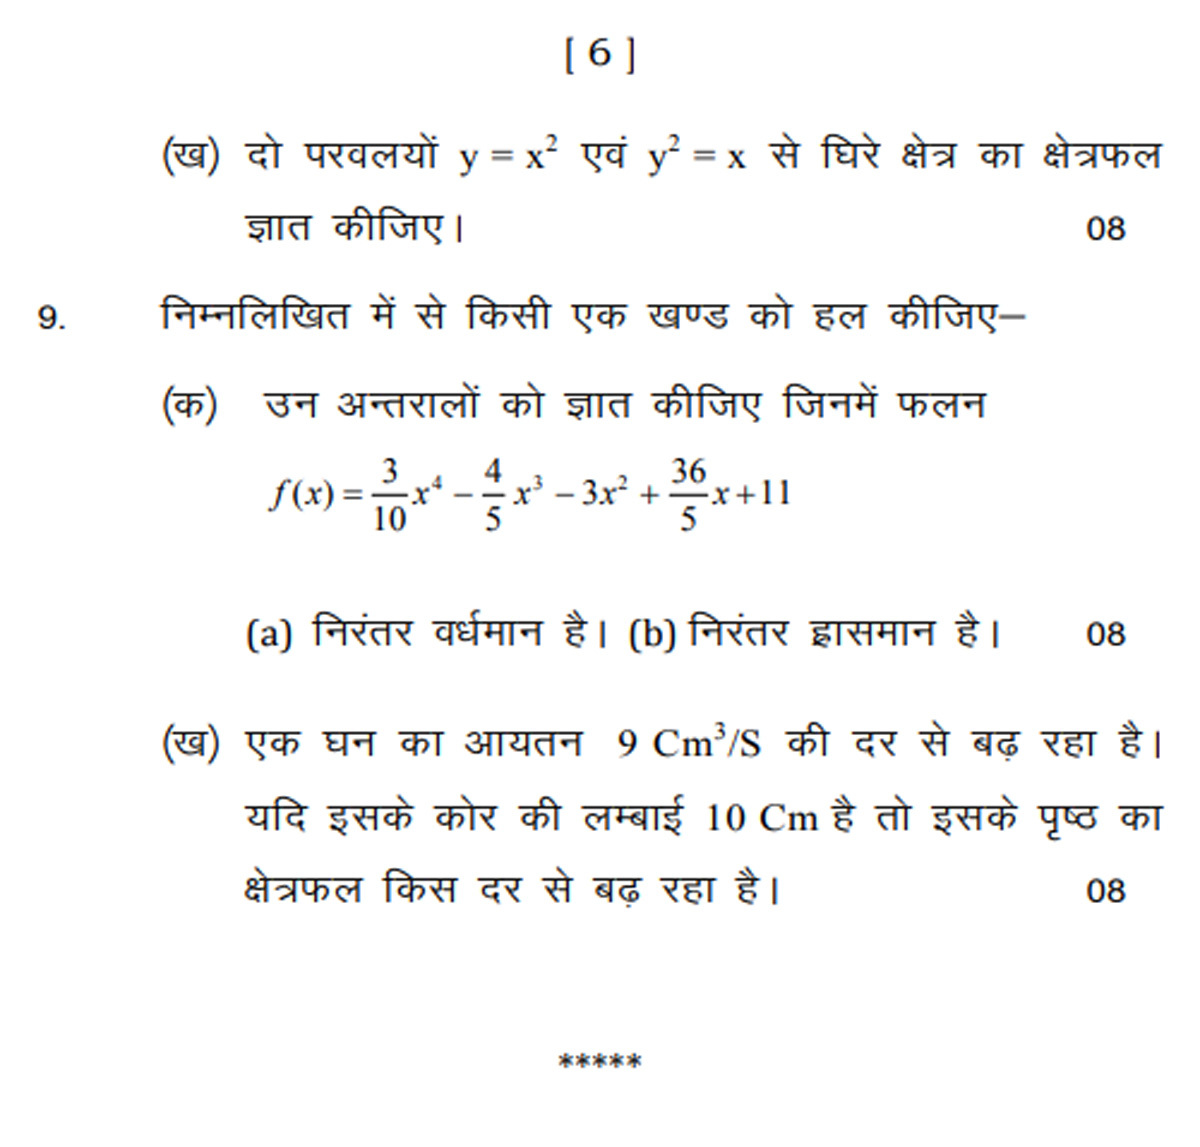 6. UP Board Class 12th Maths Model Test Paper